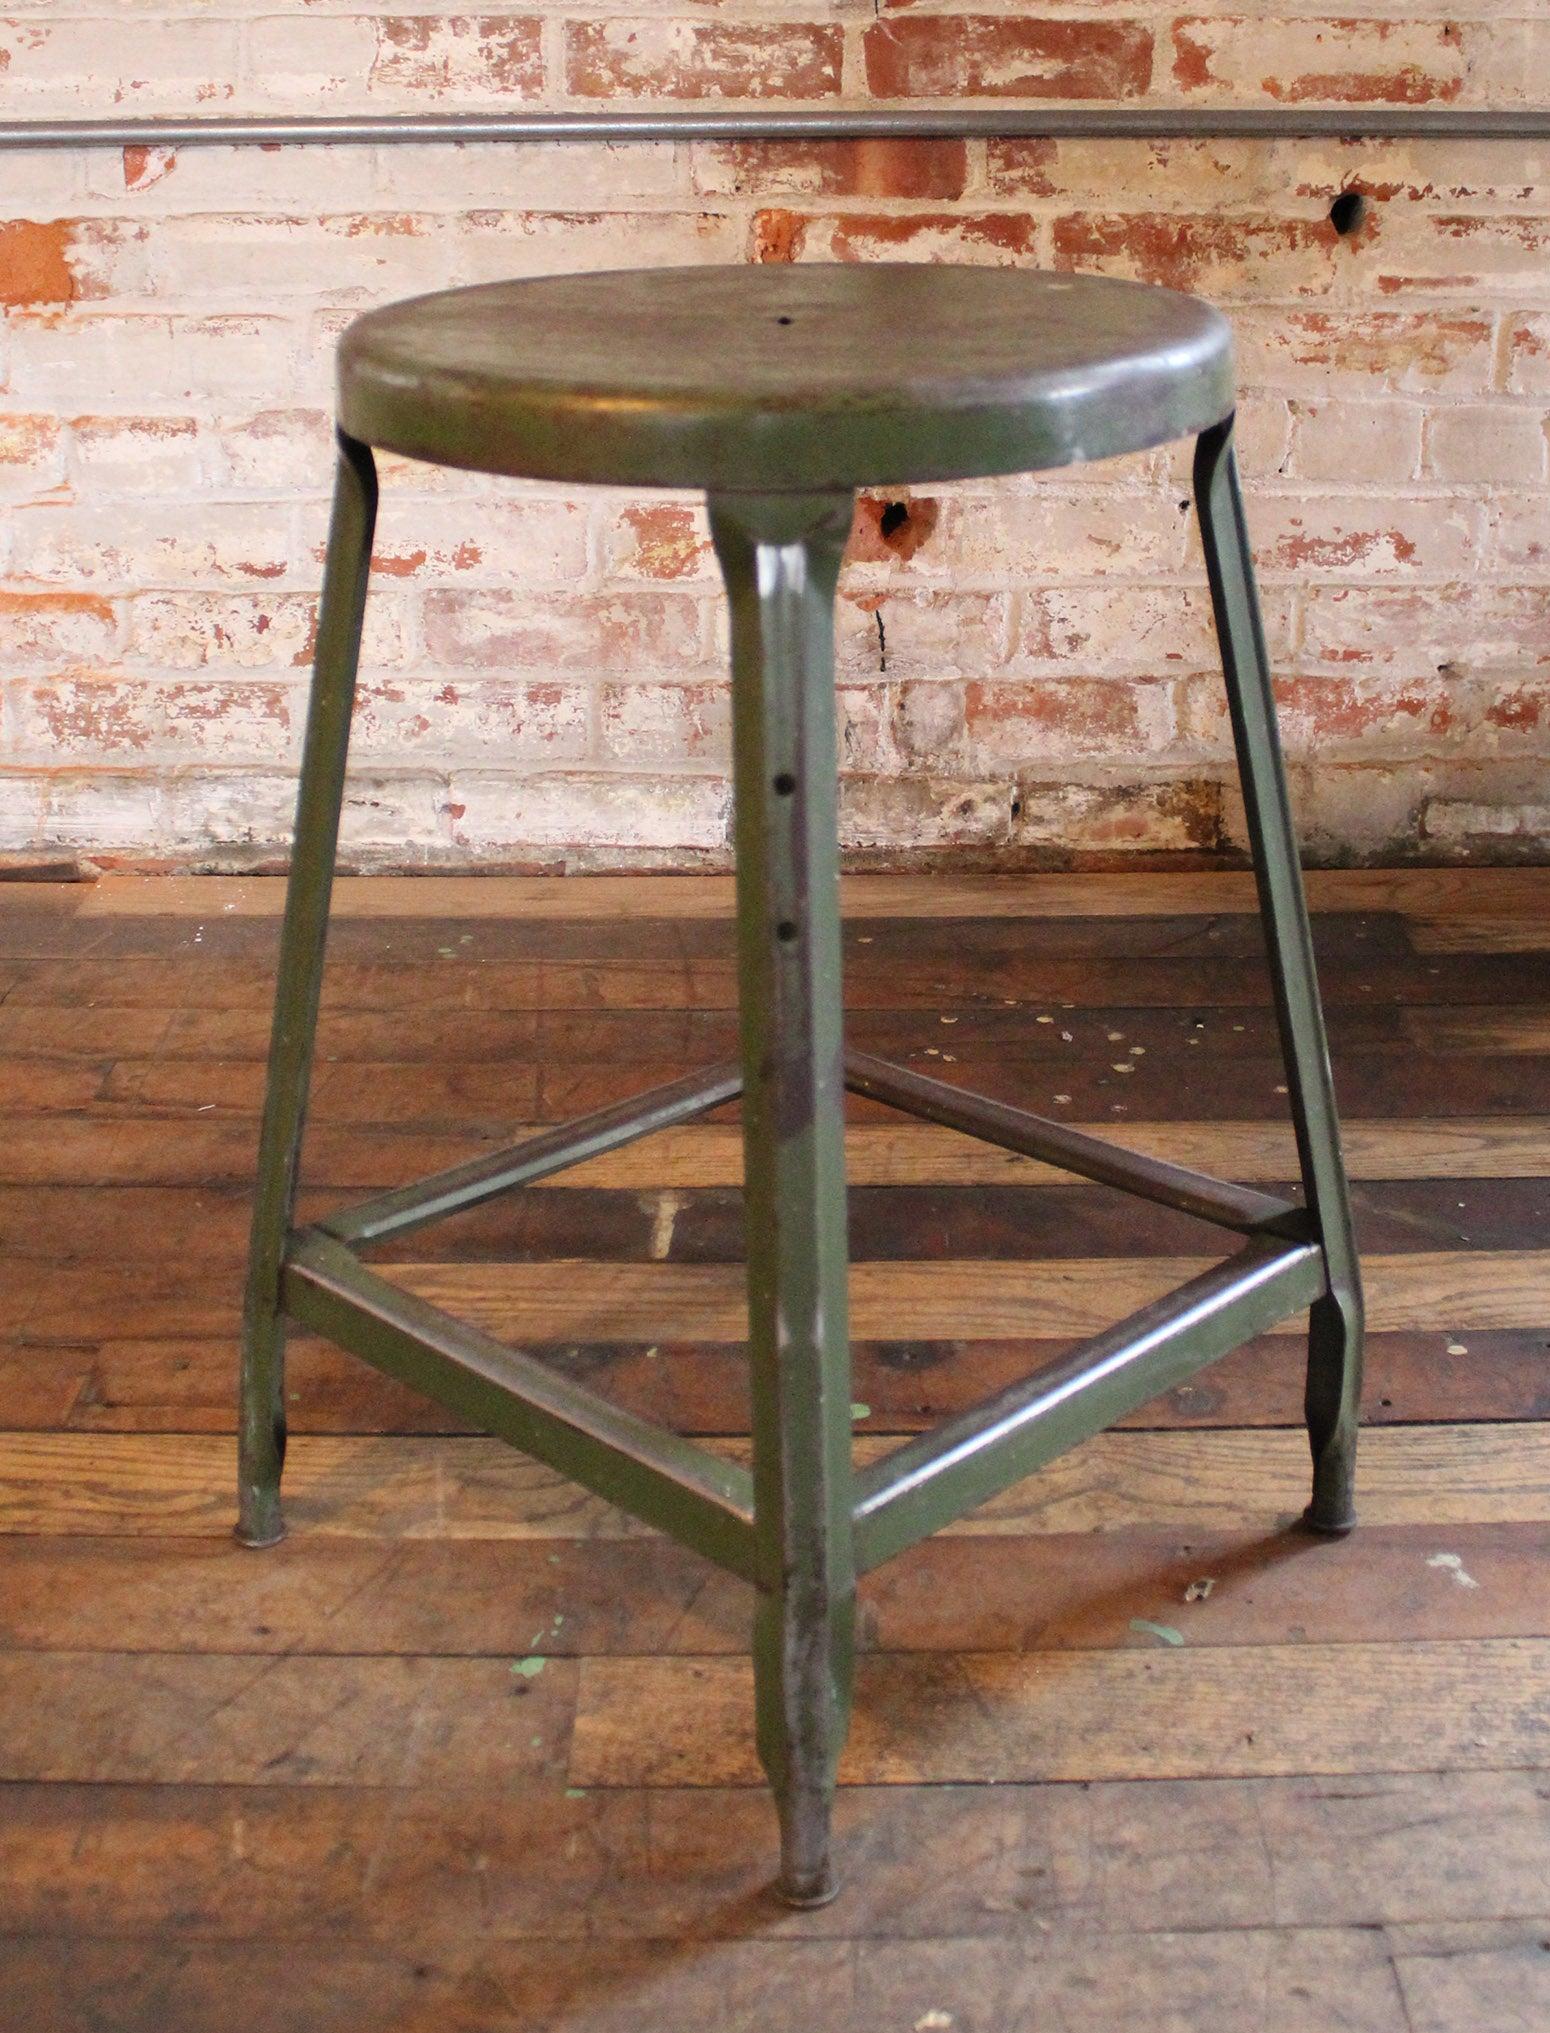 Wondrous Vintage Industrial Metal Machine Age Factory Shop Backless Stool Seat Creativecarmelina Interior Chair Design Creativecarmelinacom